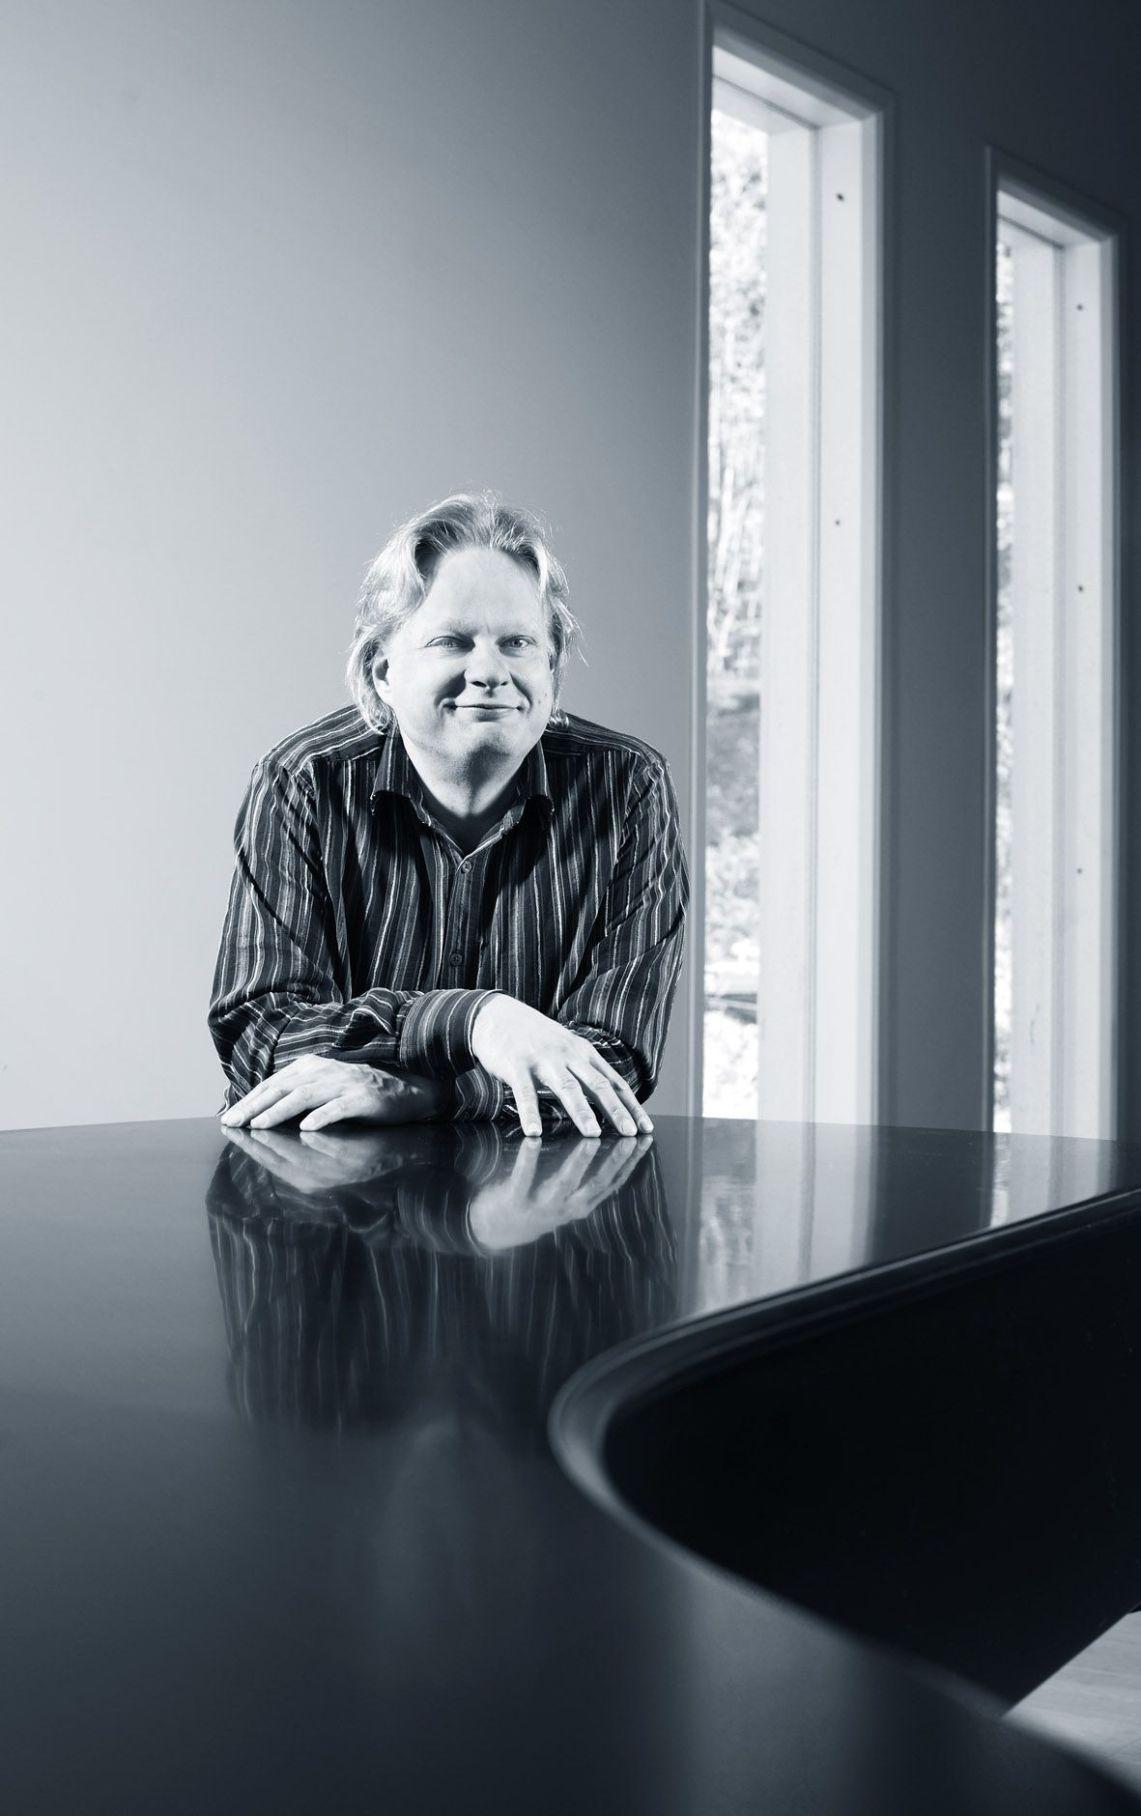 Finnish pianist unleashes storm